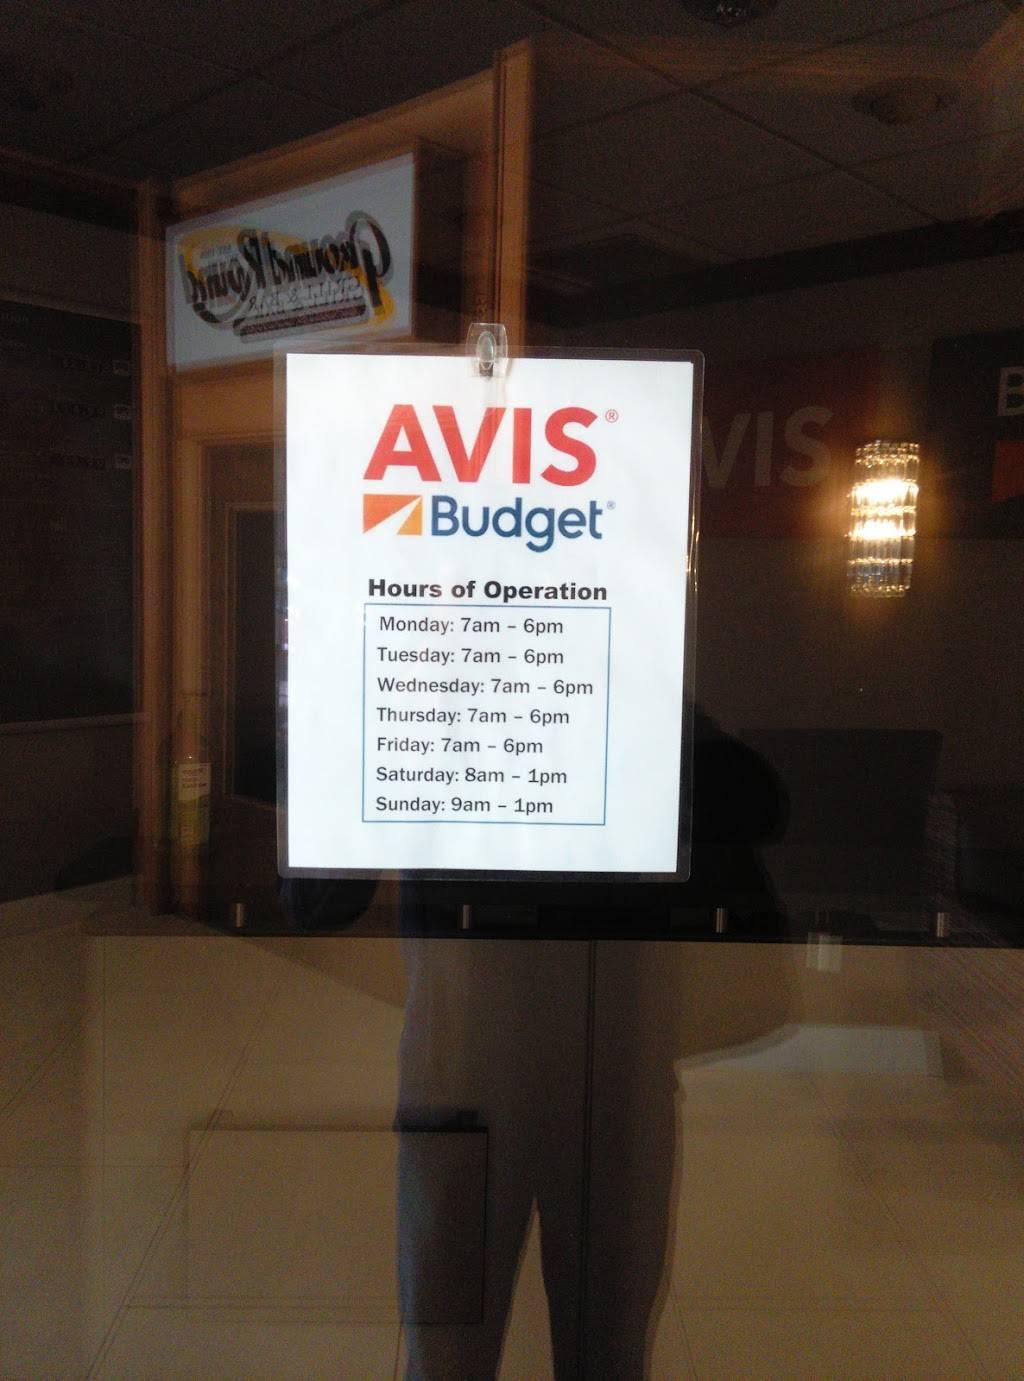 Budget Car Rental - car rental  | Photo 2 of 4 | Address: 1005 S Moorland Rd, Brookfield, WI 53005, USA | Phone: (262) 796-2947